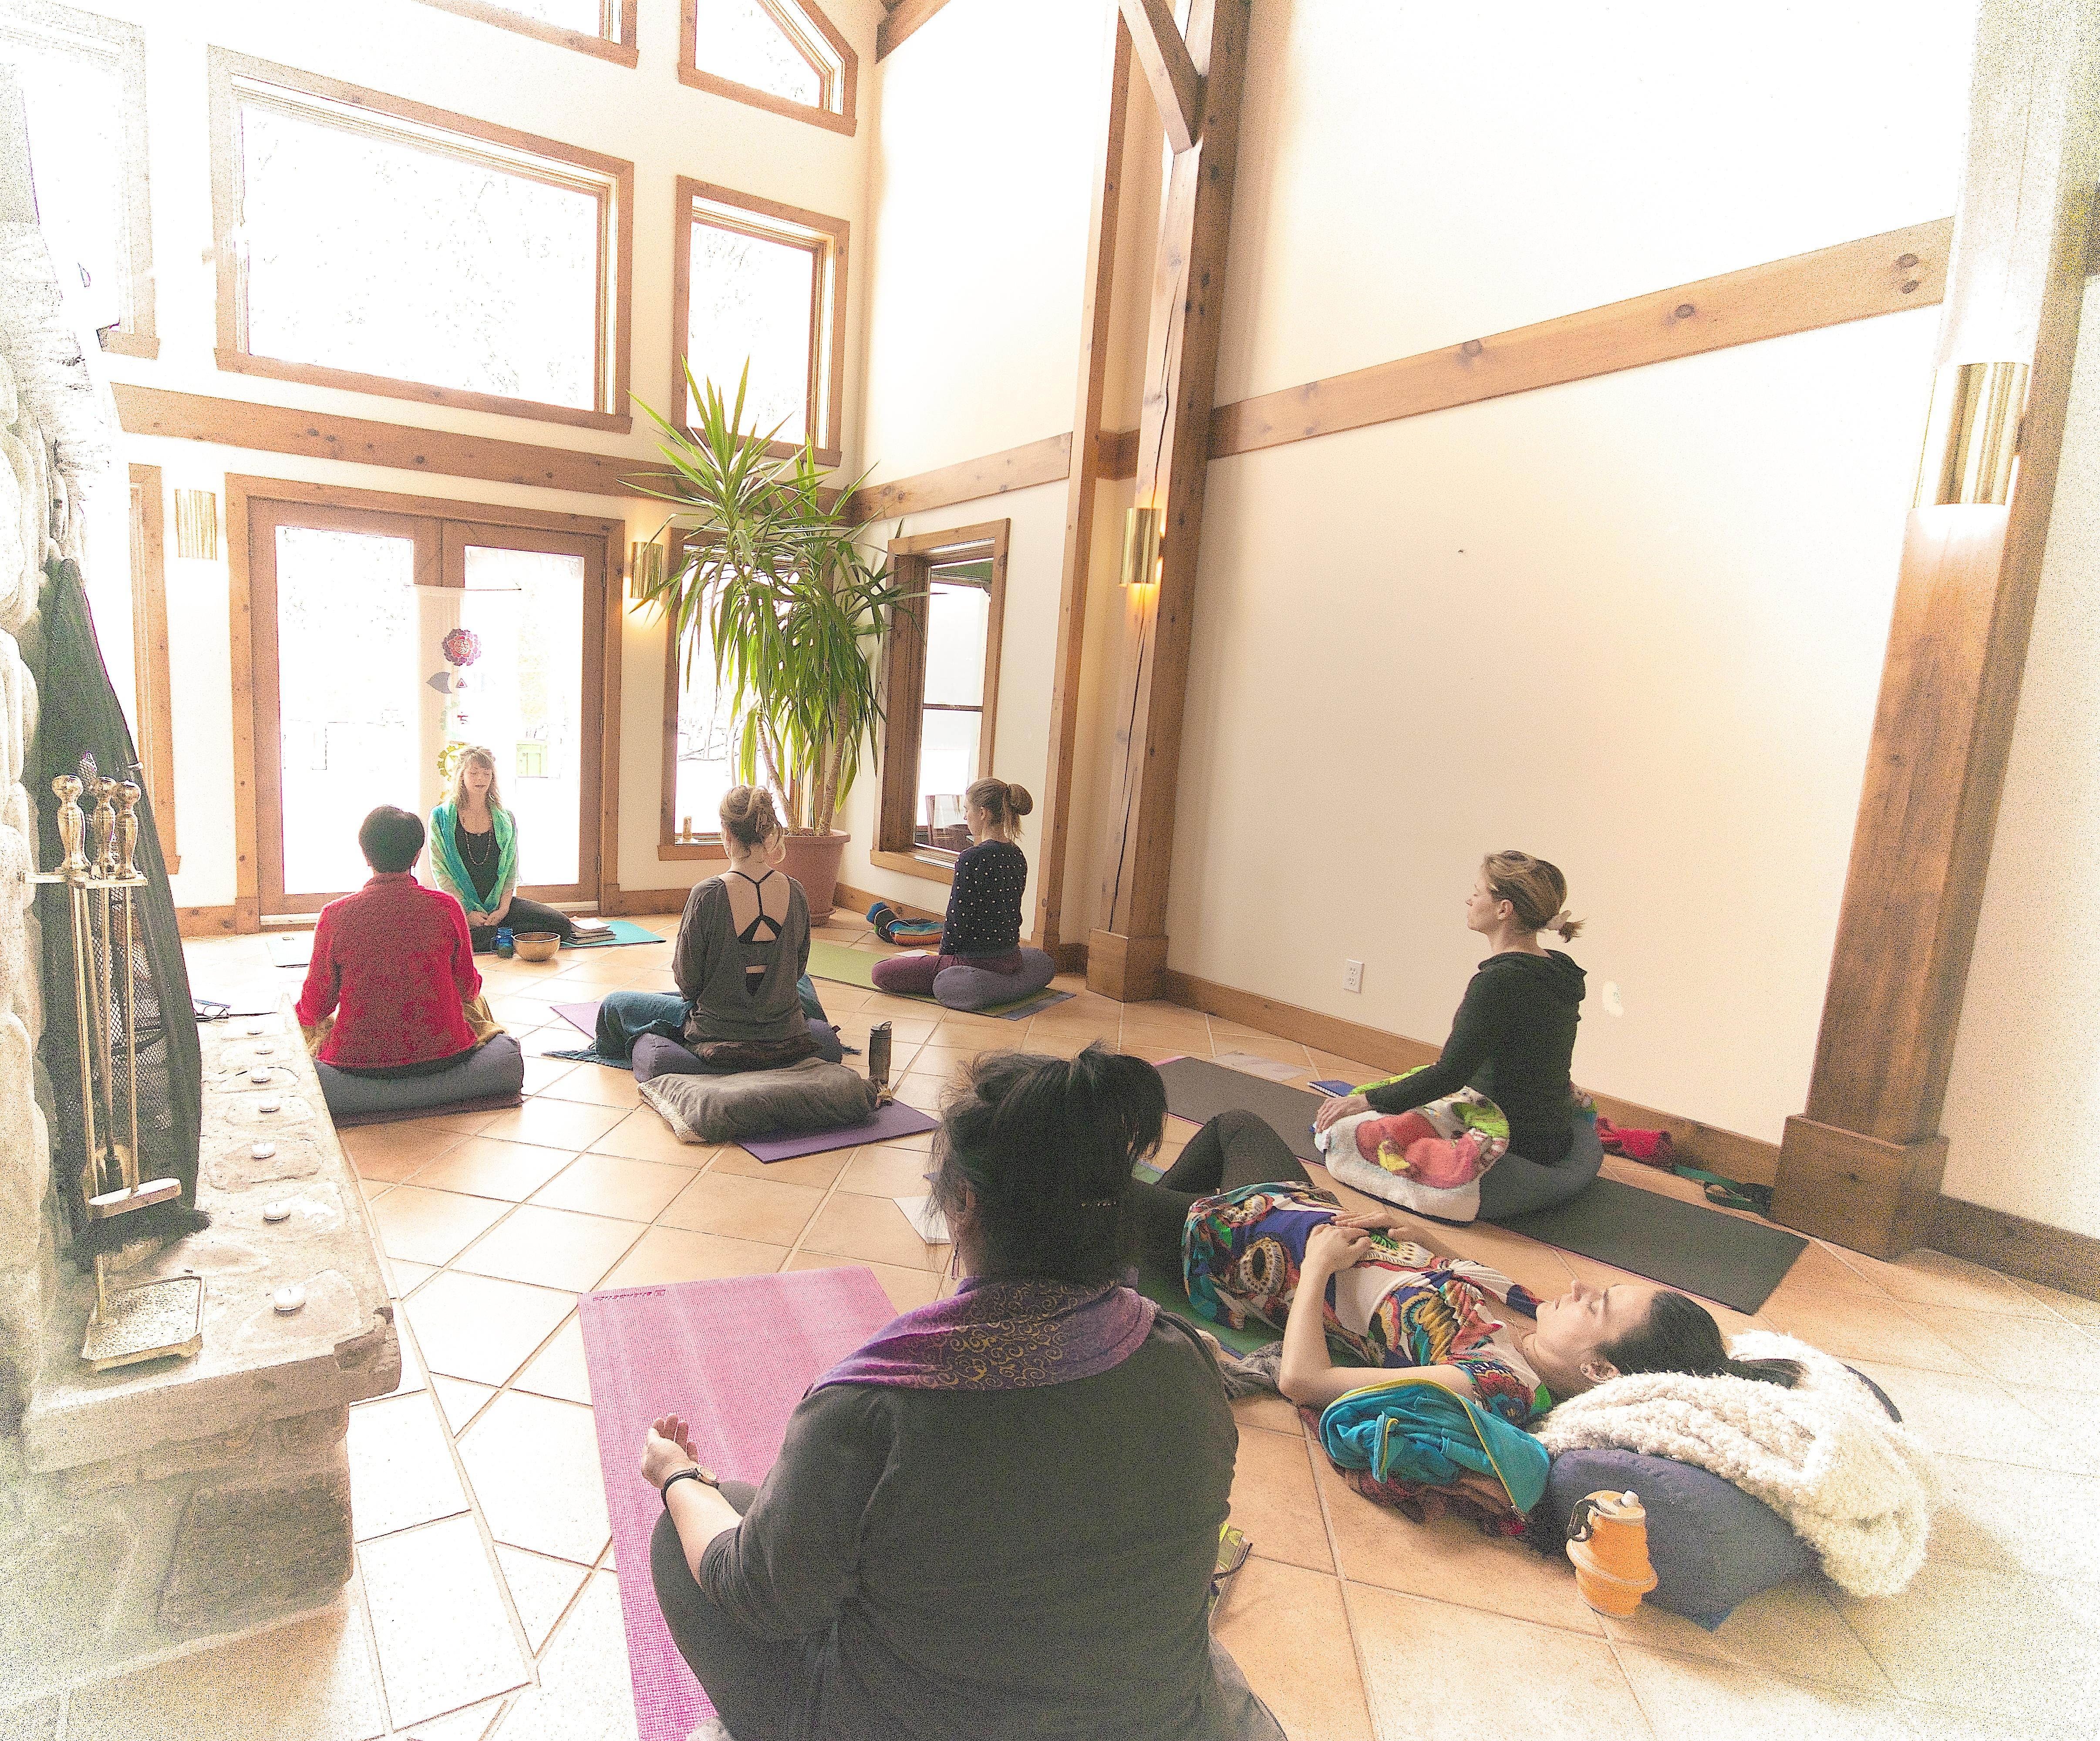 tamara retraite yoga 2